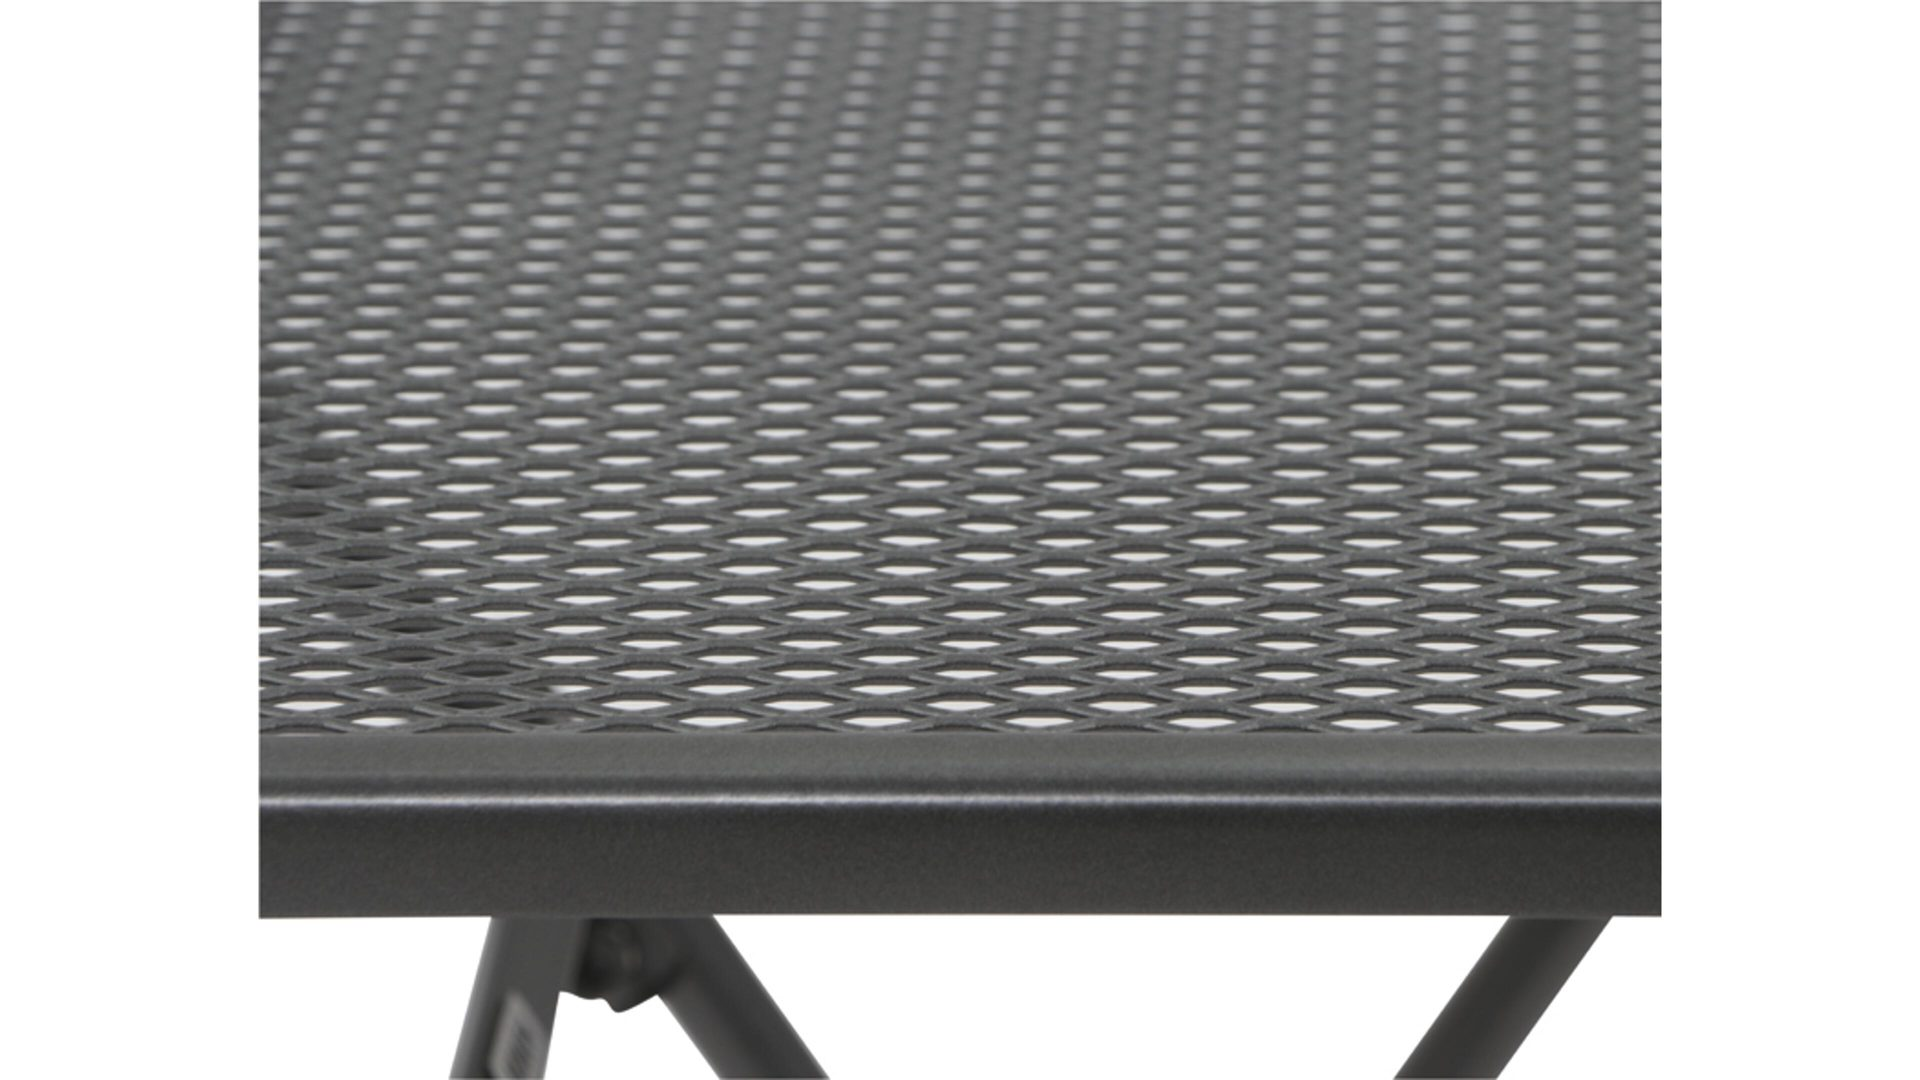 Mwh Tisch Cafe Latte Eisengraues Metall Ca 60 X 60 Cm Lahr